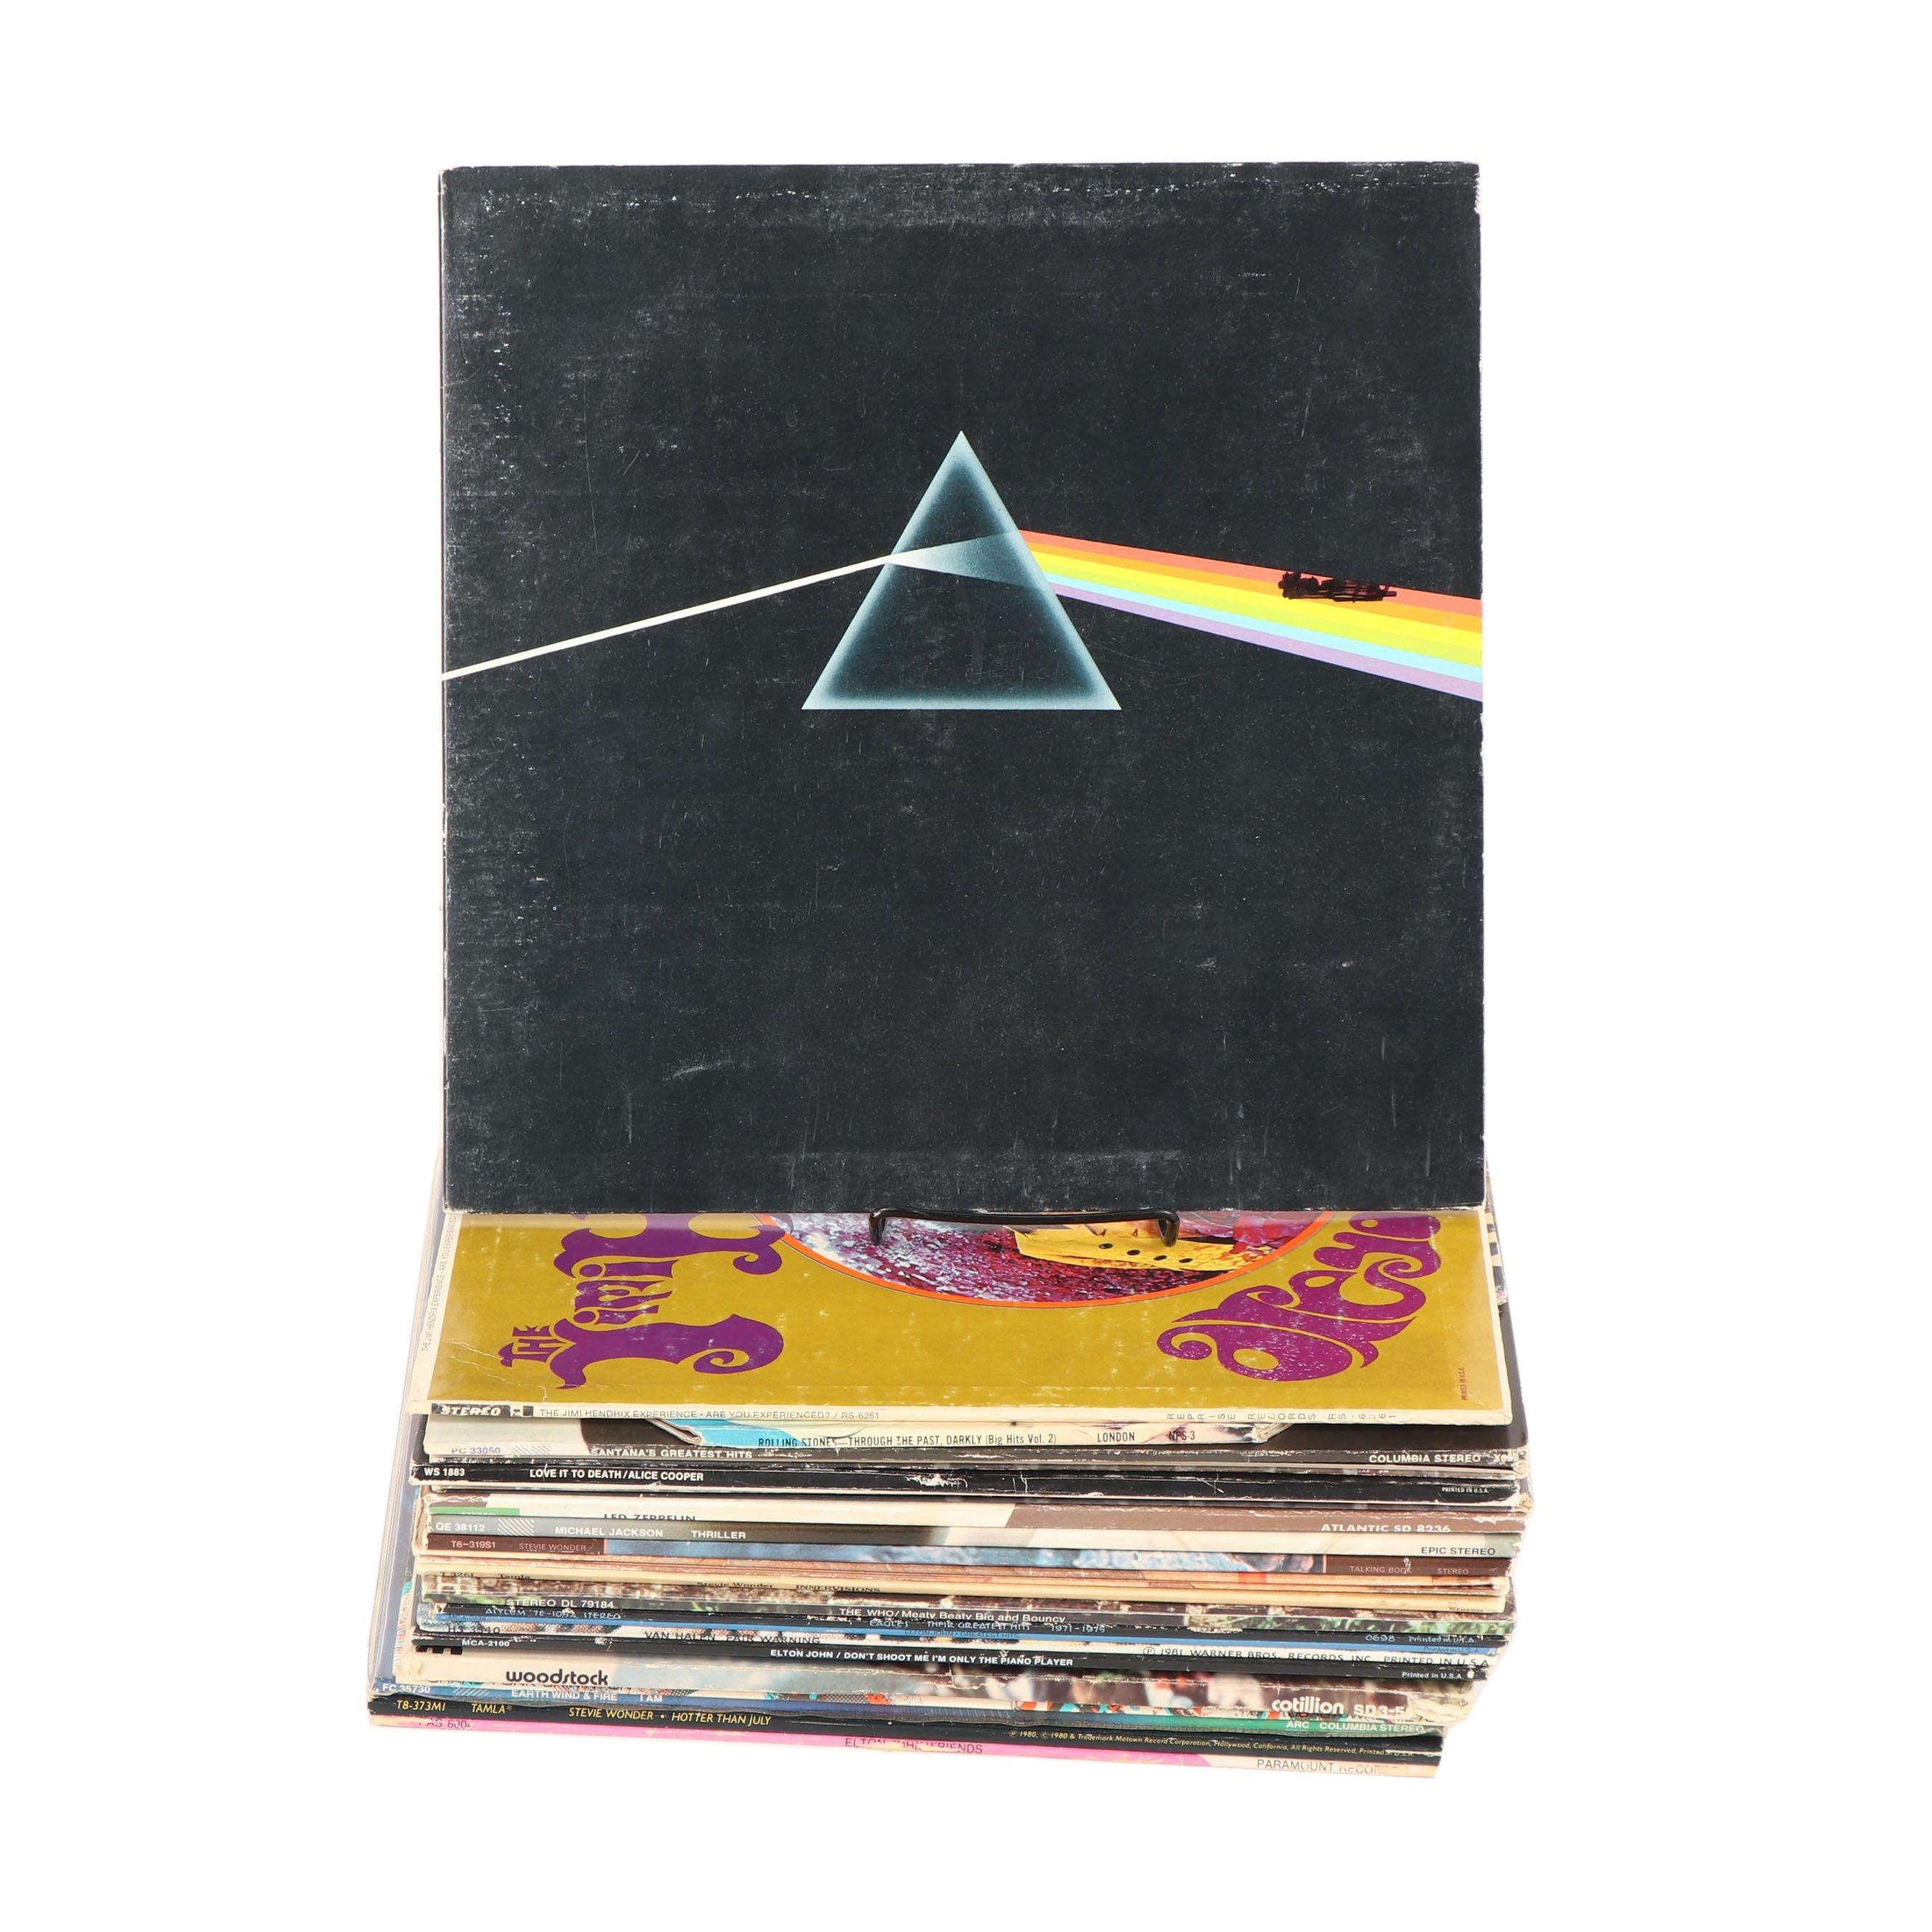 1970s-1980s Rock Records including Led Zepplin, Pink Floyd and Van Halen